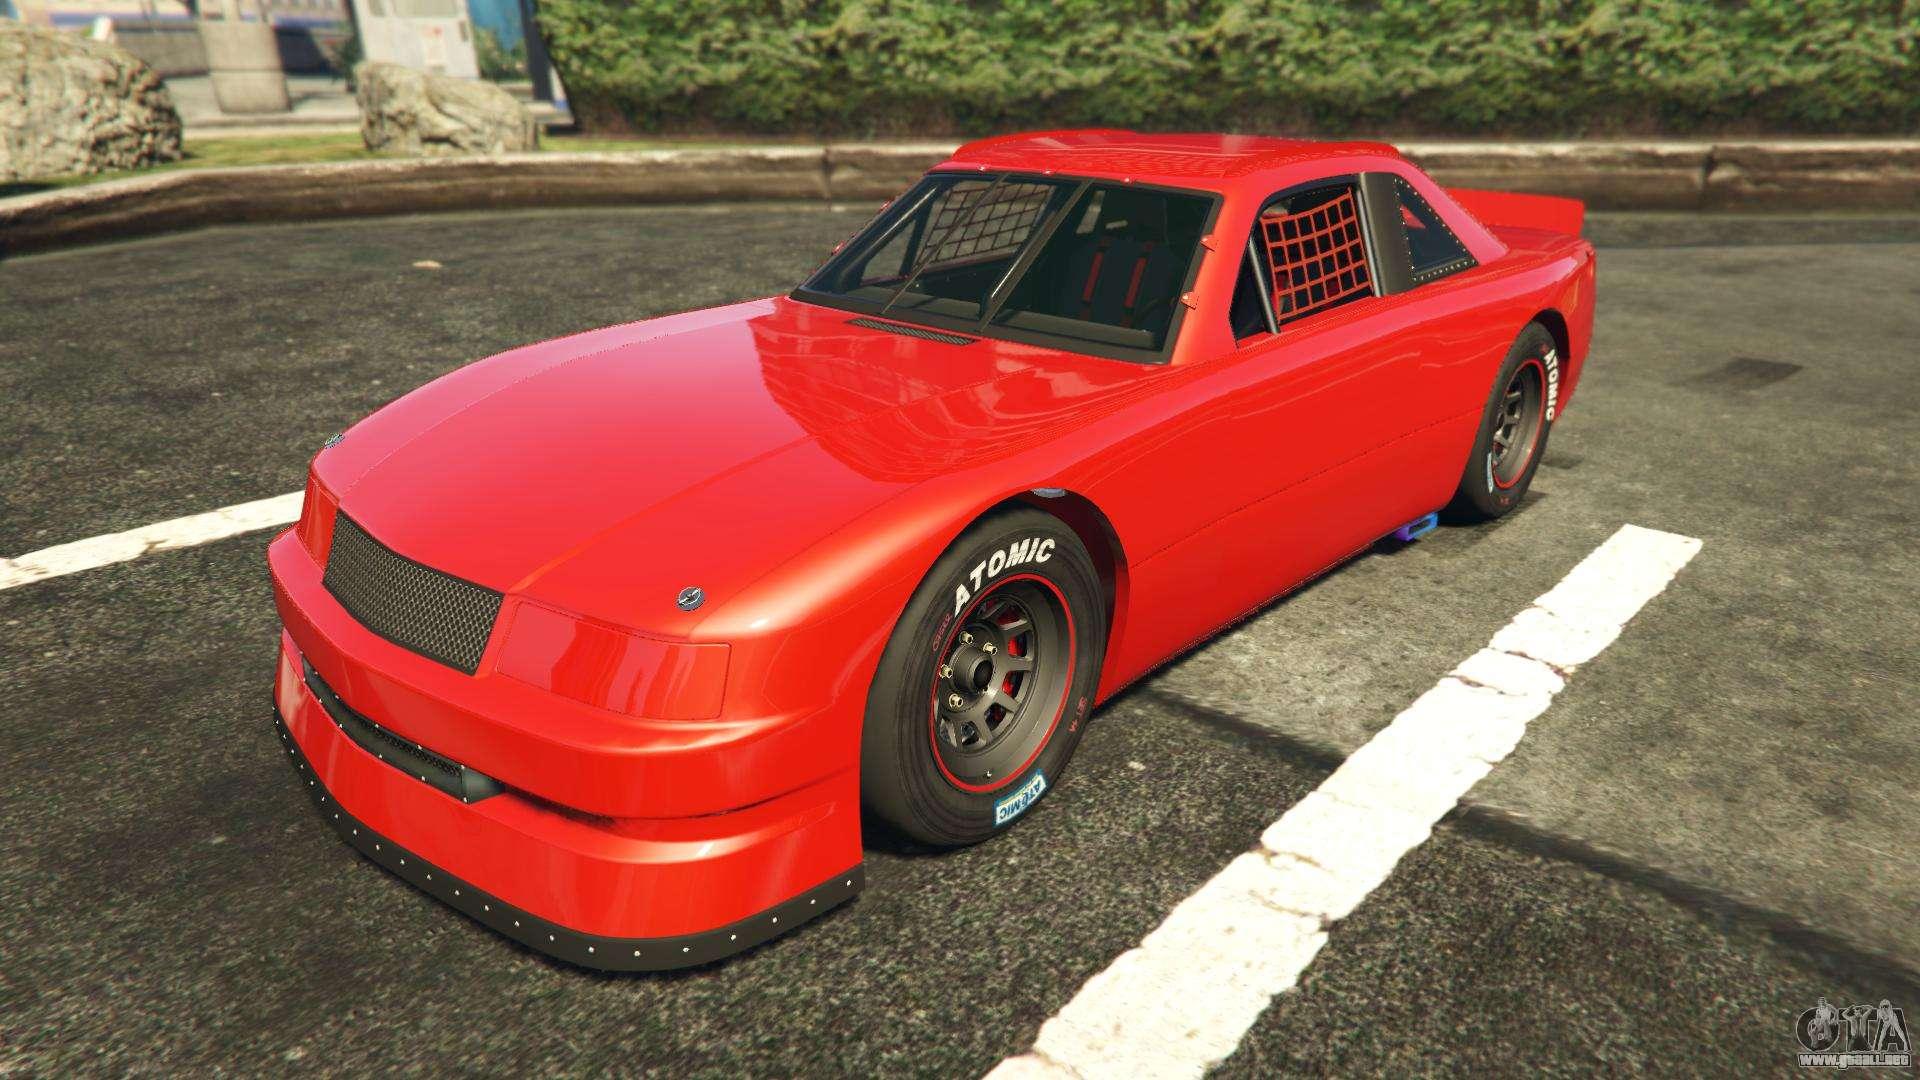 Declasse Hotring Sabre GTA V